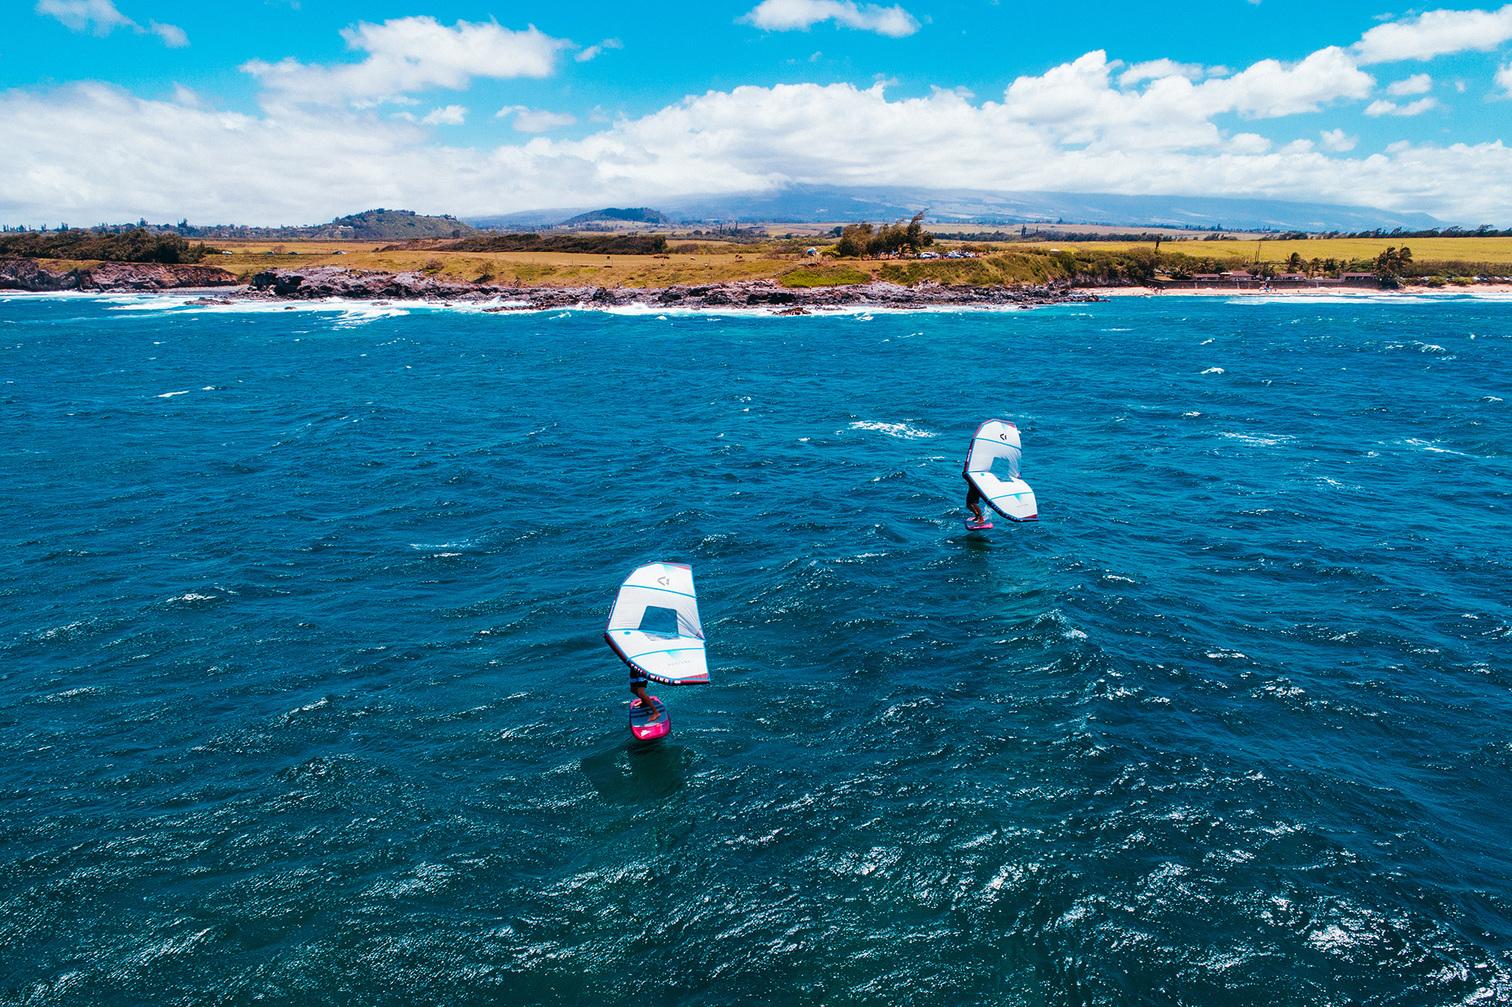 Klaas Sky SkySUP Wing DJI 0113-Maui2019-Fanatic-Duotone-marcusfriedrich.media